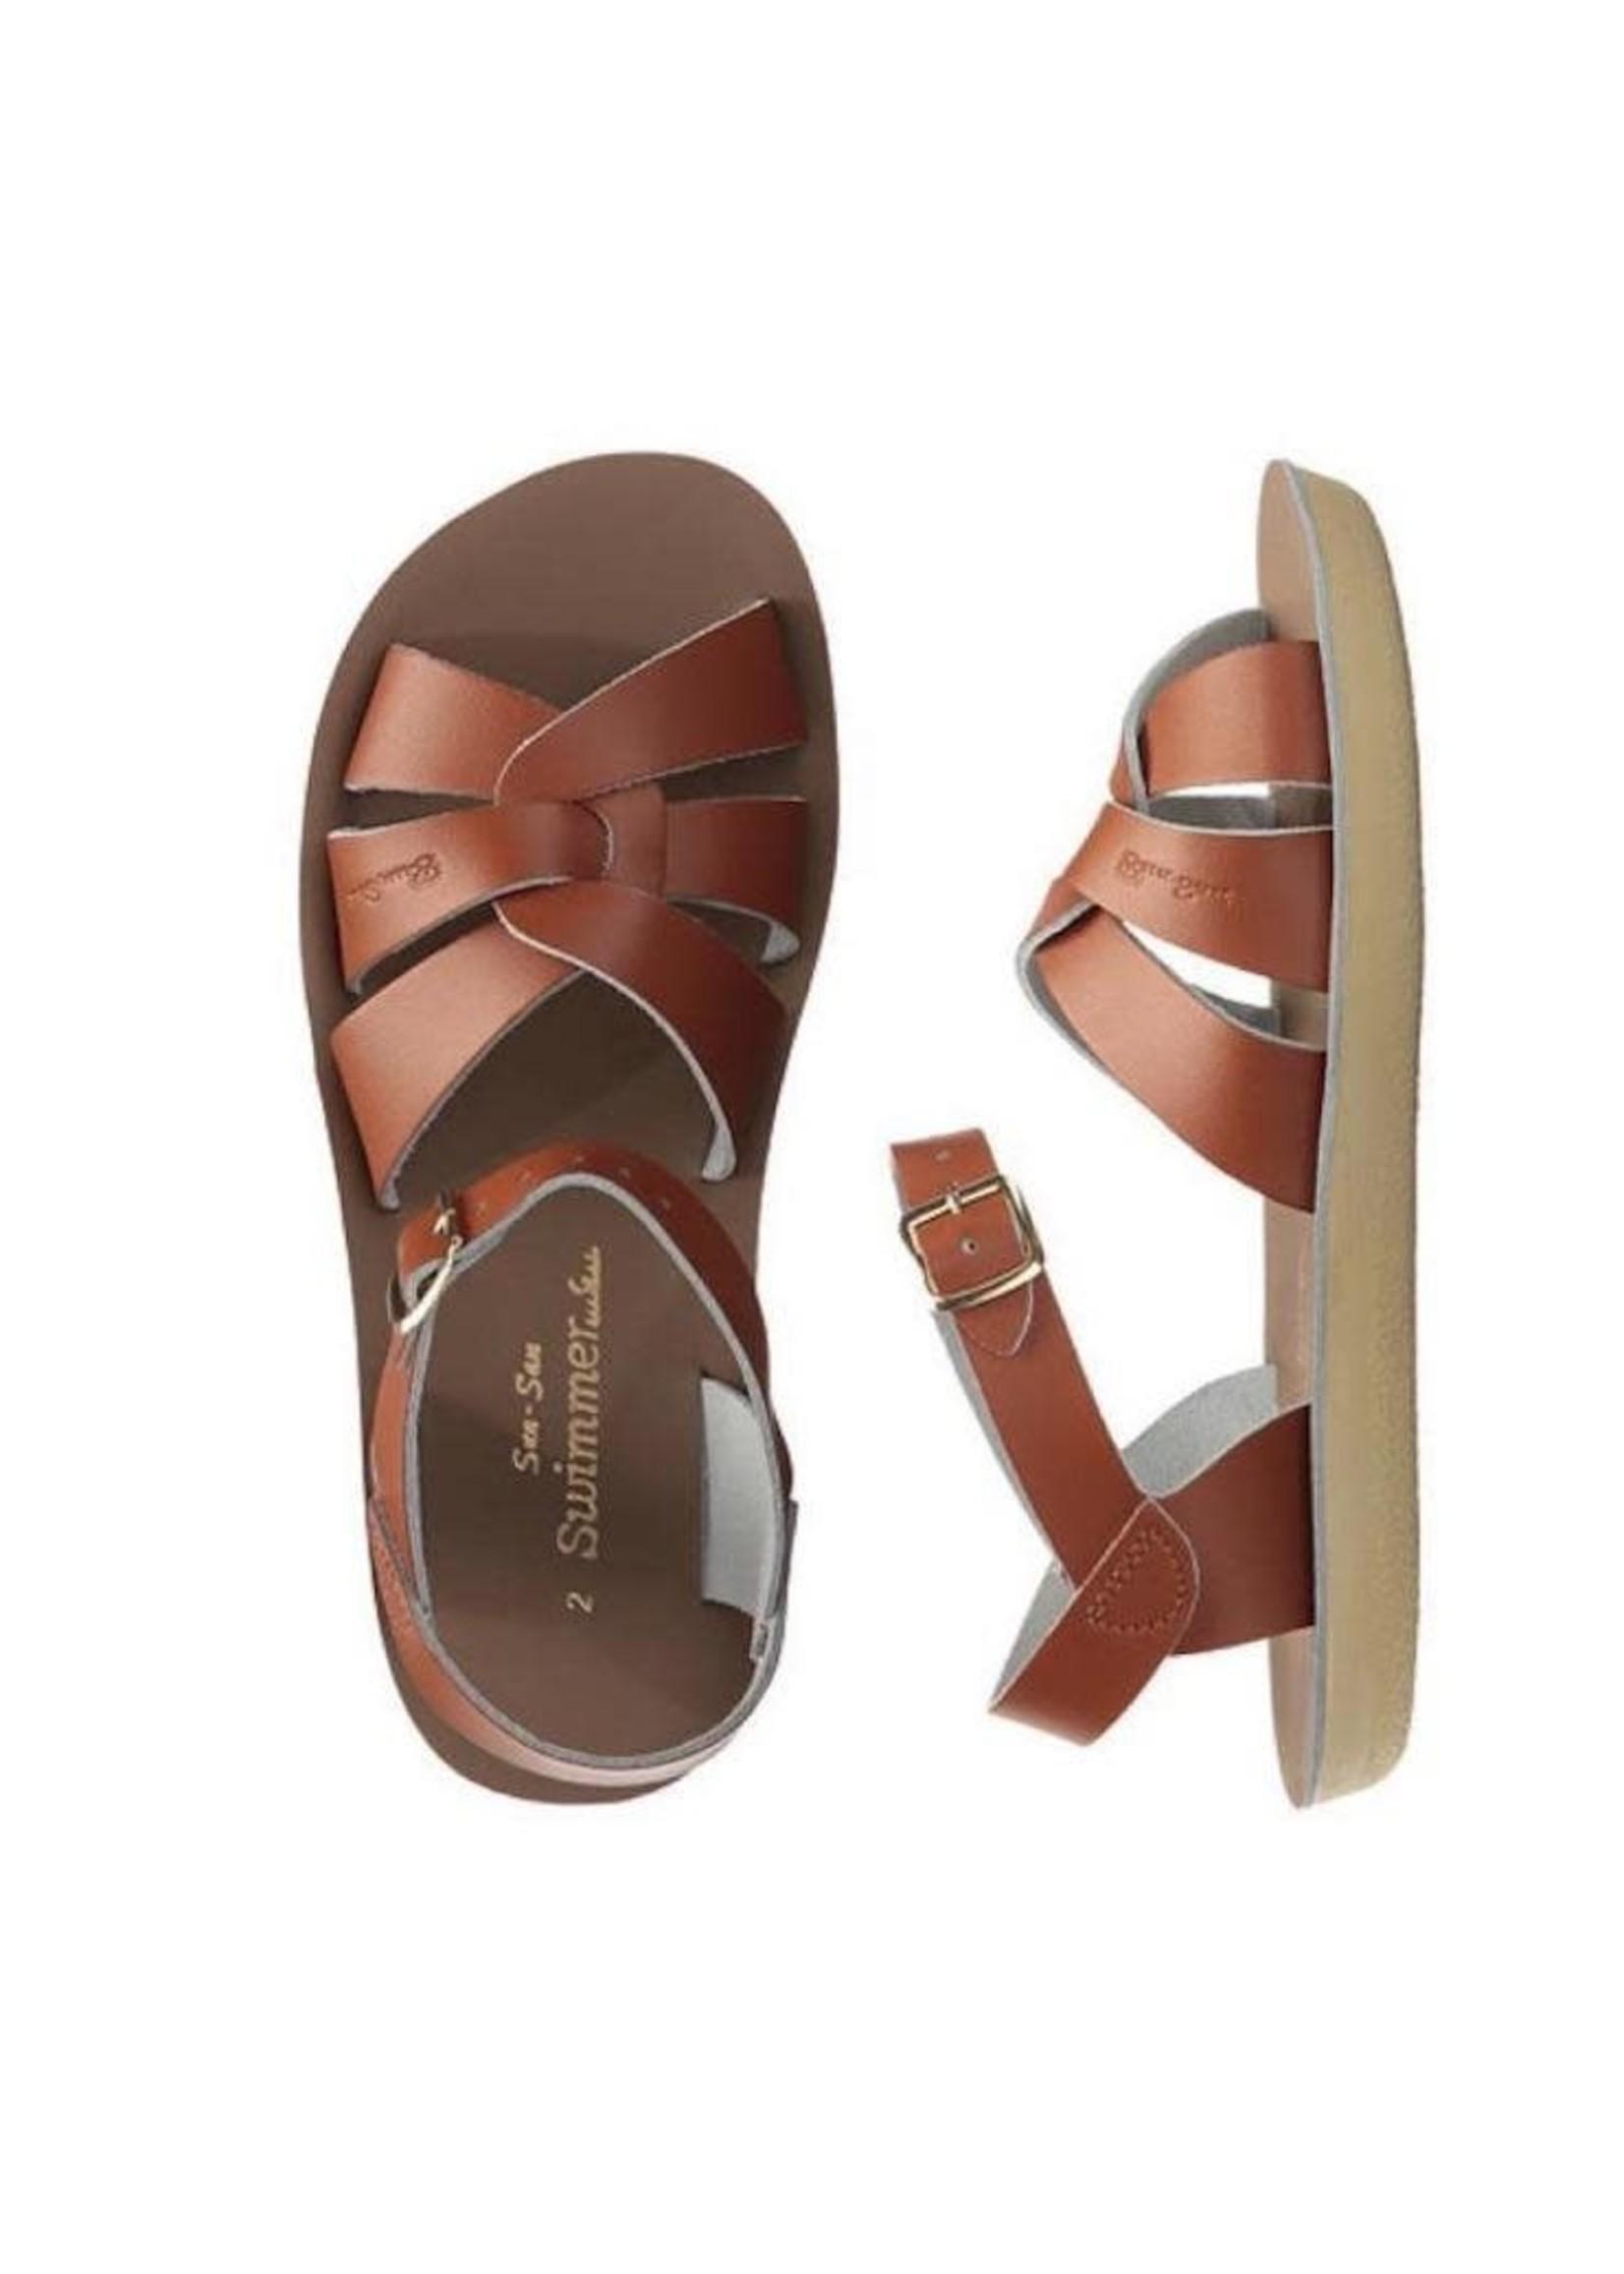 Salt Water Sandals Salt Water Sandal, Swimmer, Youth